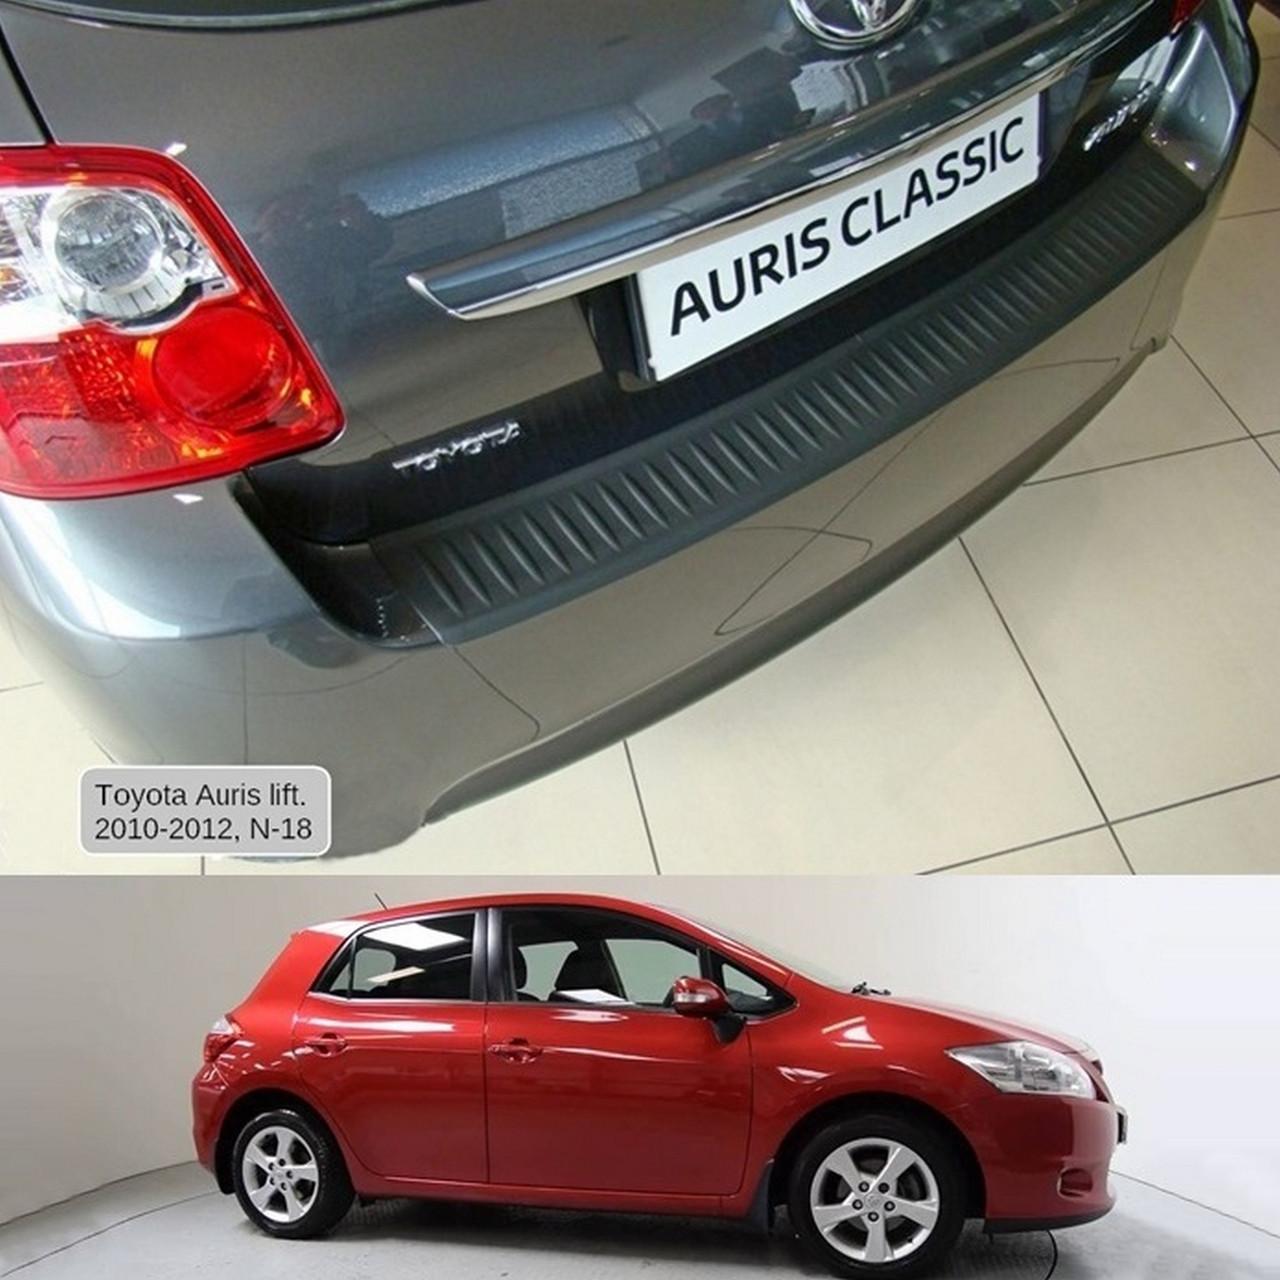 Пластиковая защитная накладка на задний бампер для Toyota Auris 3/5dr. 2010-2012